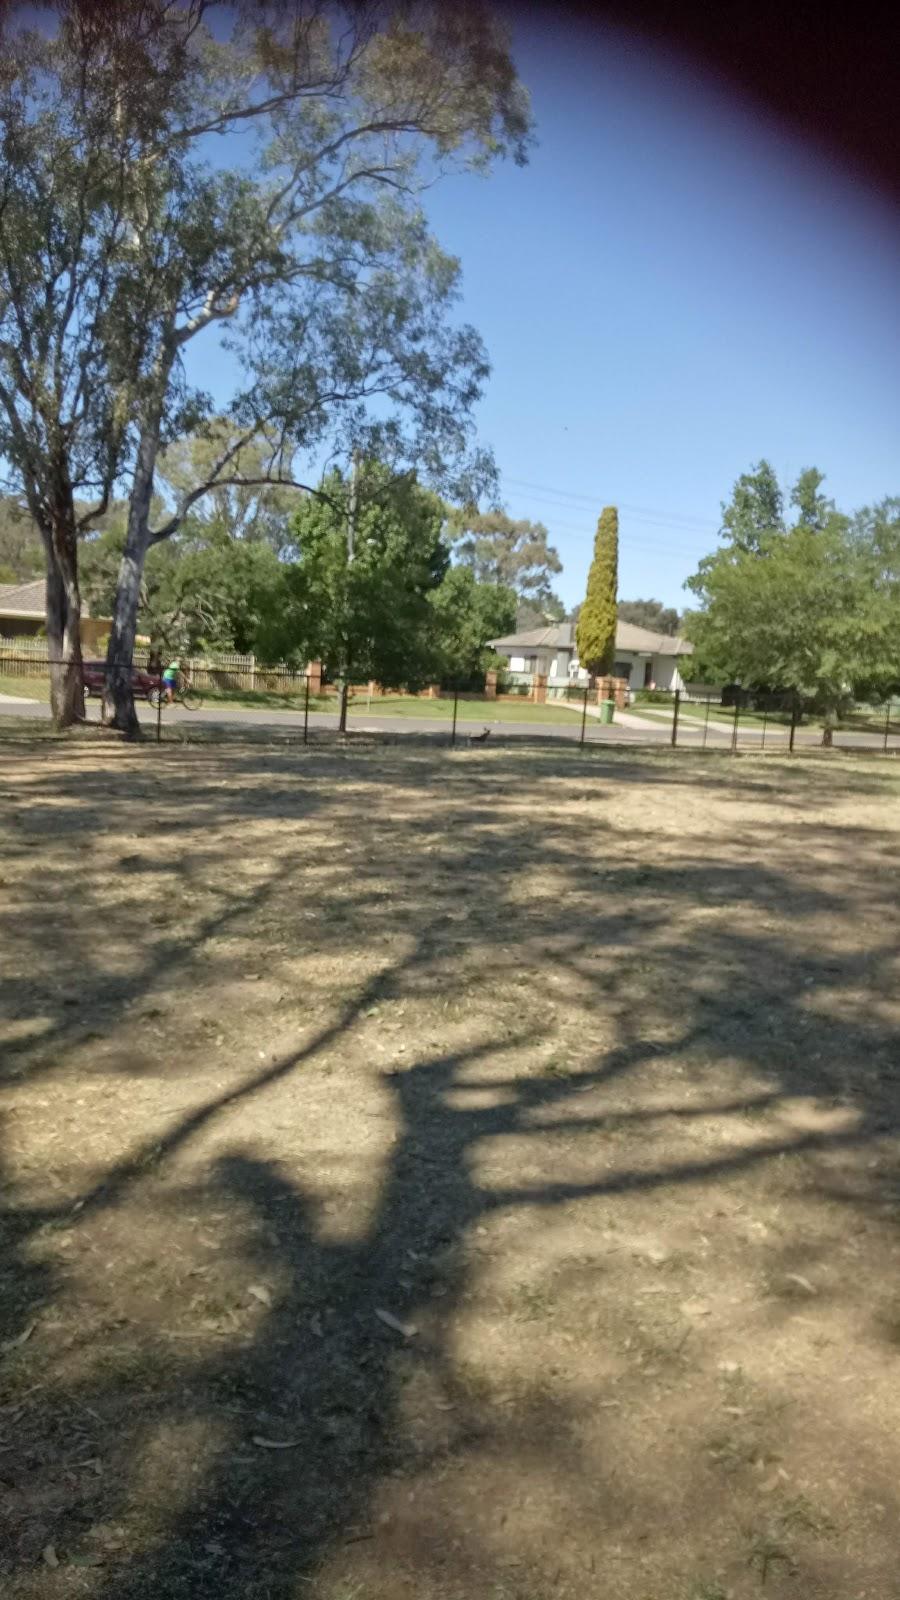 Alexandra Park Leash Free Area | park | 261 Cadell St, East Albury NSW 2640, Australia | 0260238111 OR +61 2 6023 8111